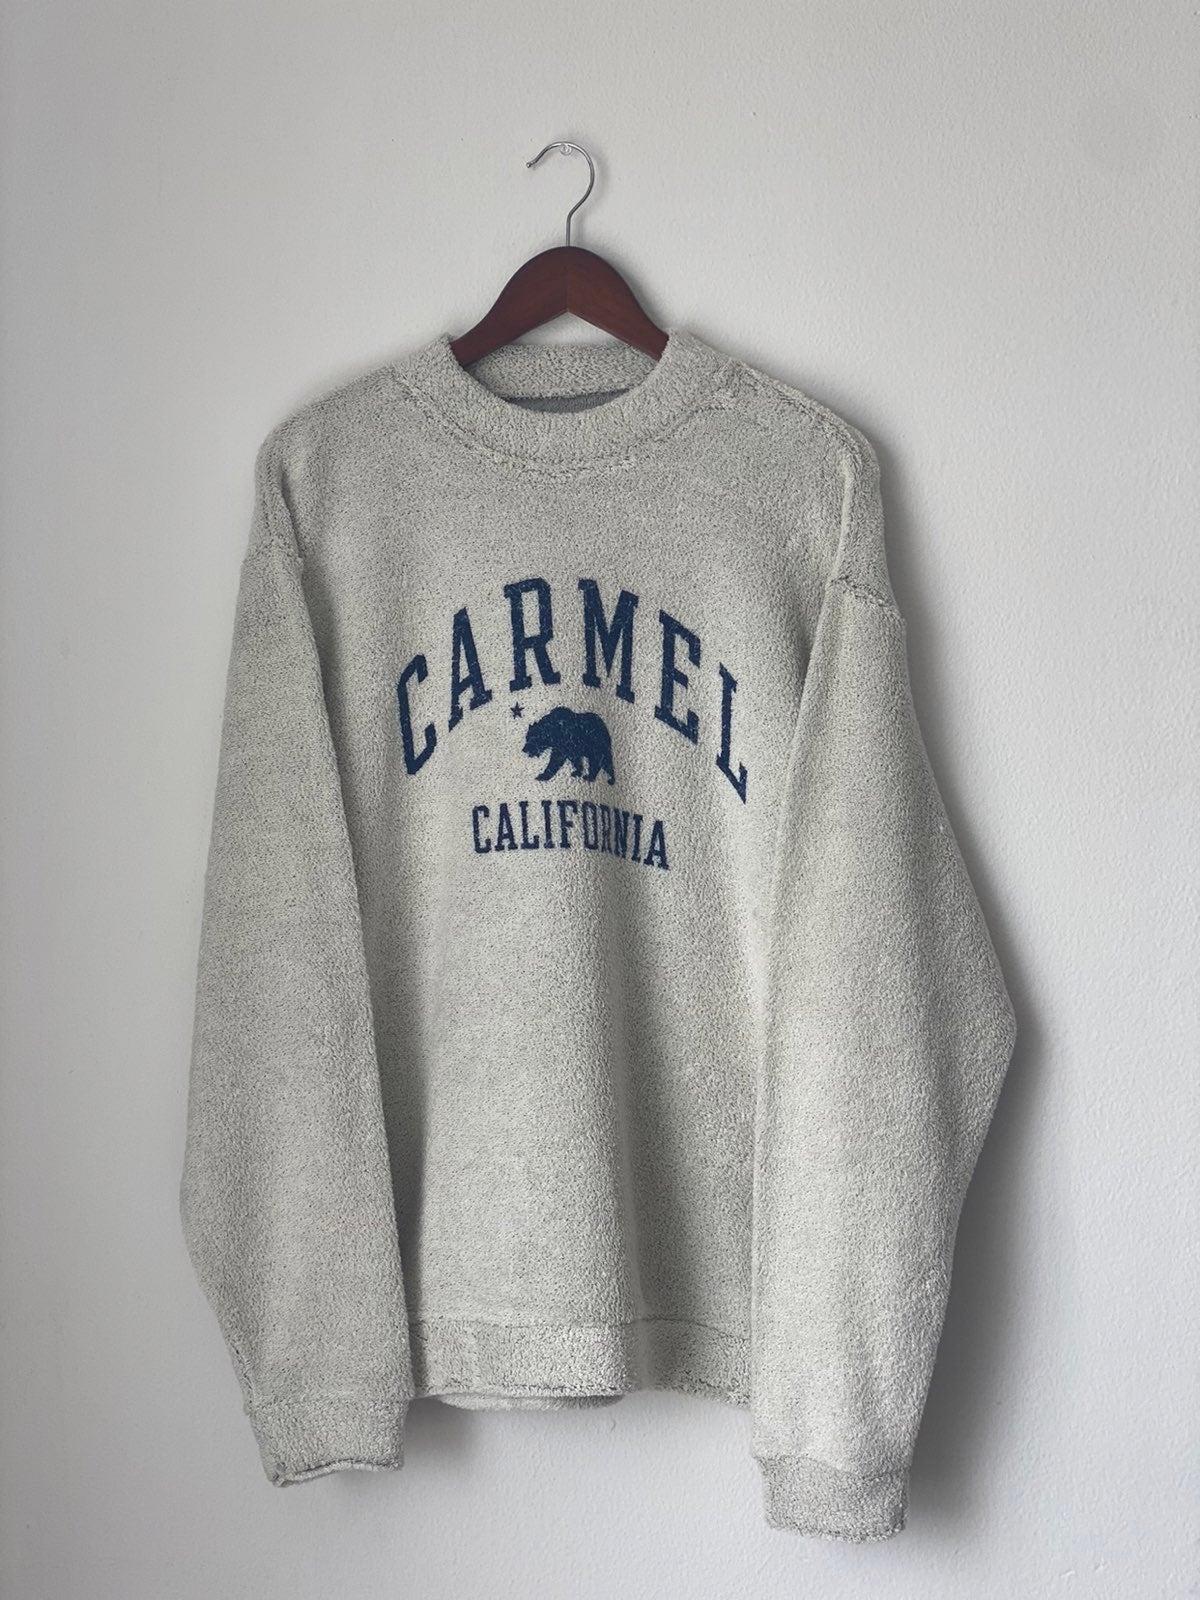 NWT Austins Carmel Sweatshirt Sz L